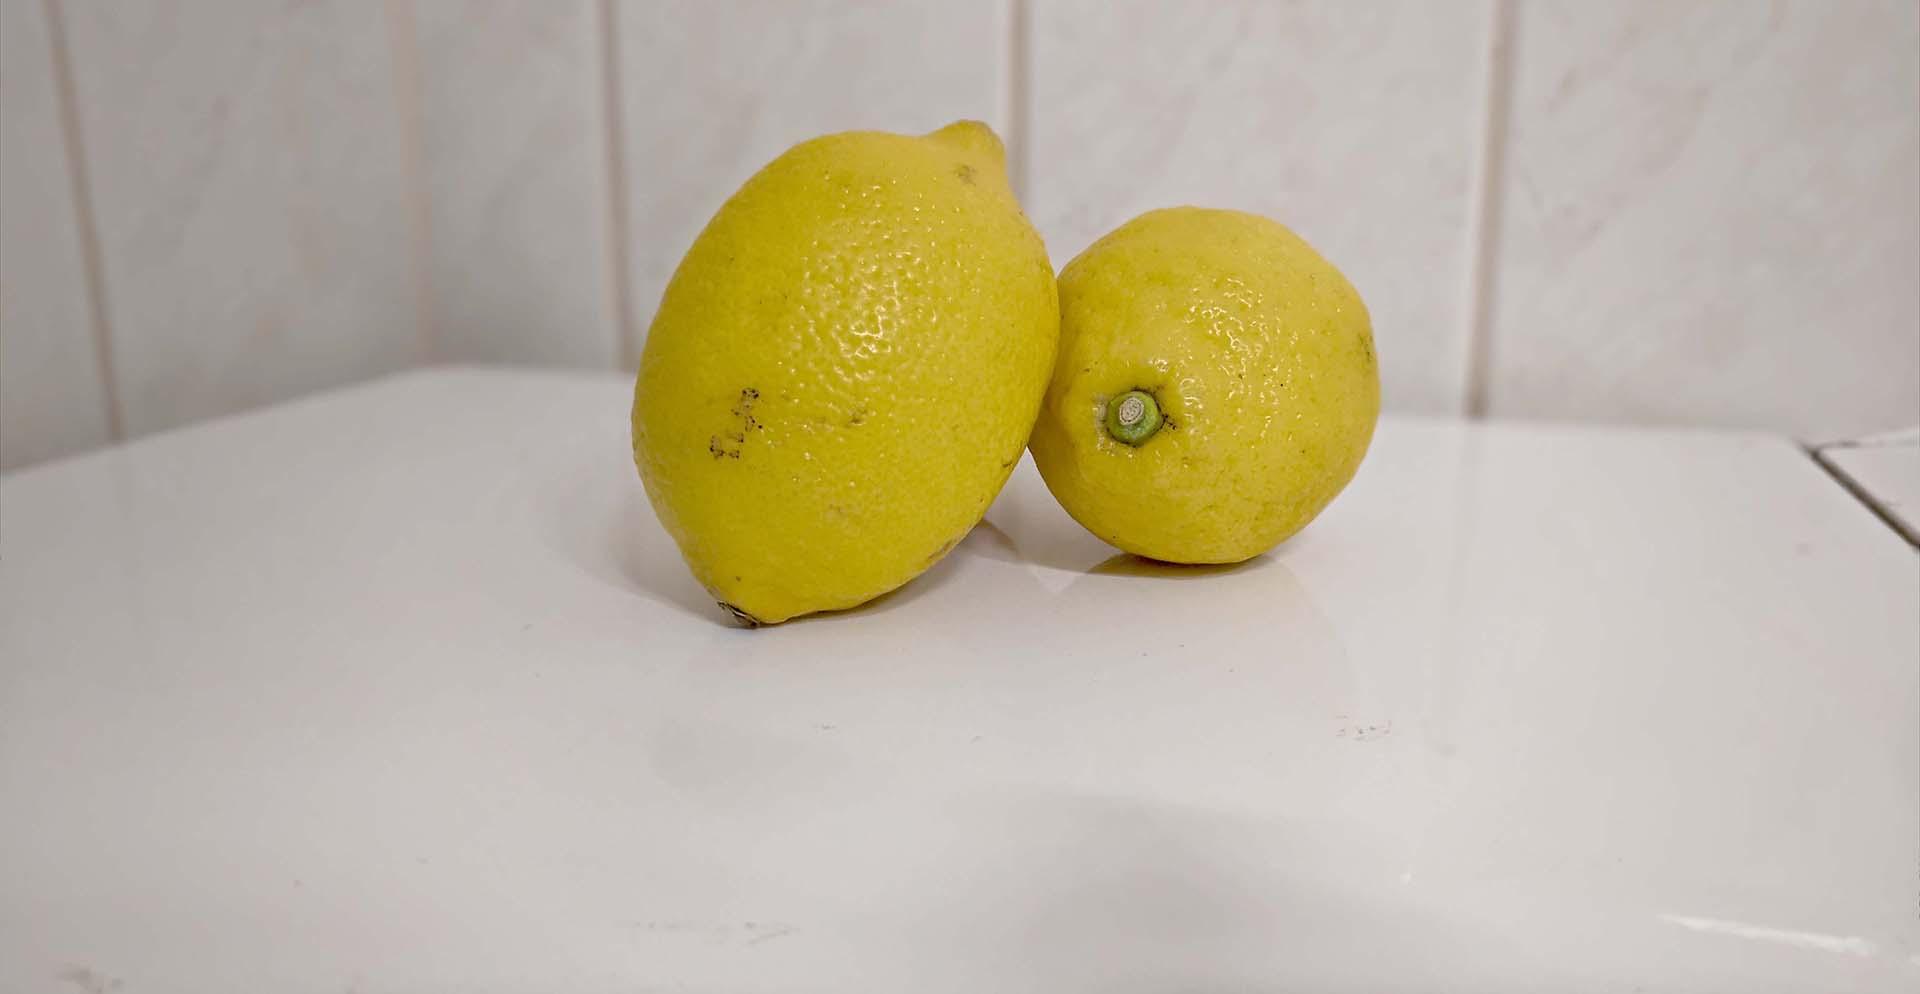 pesukoneen puhdistus sitruunahapolla02